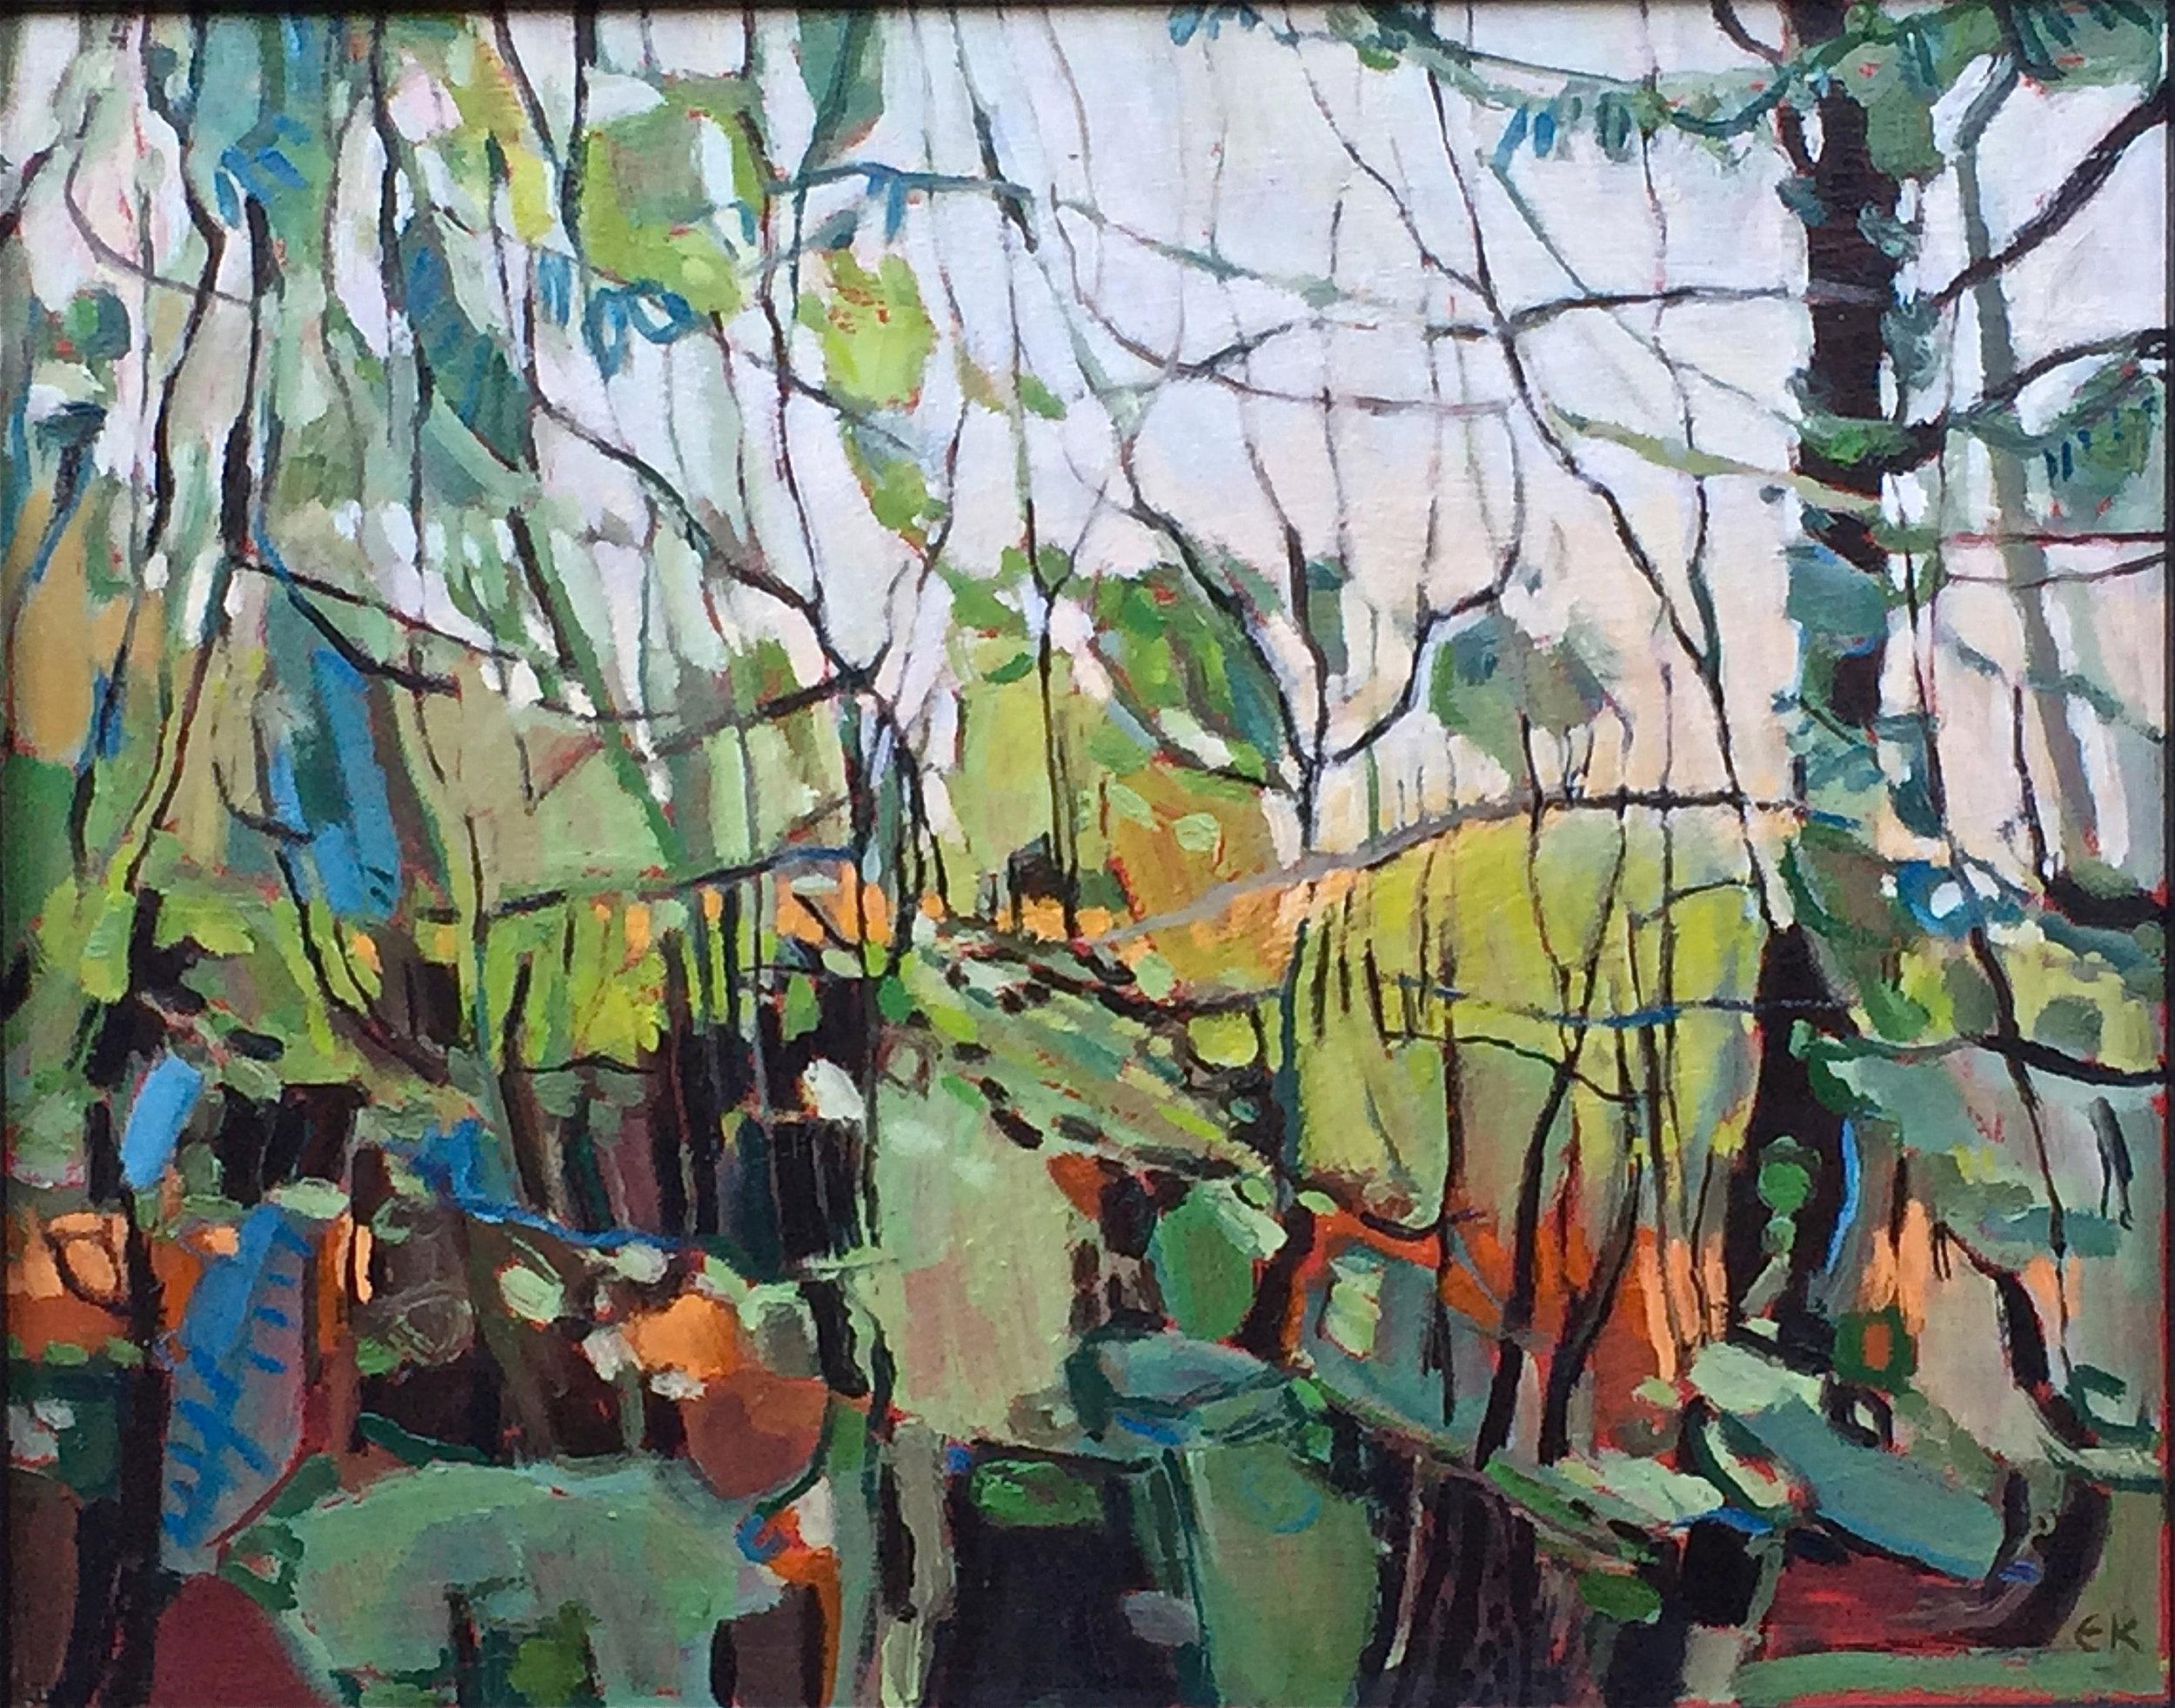 Ploughman Wood, Bright Autumn Day